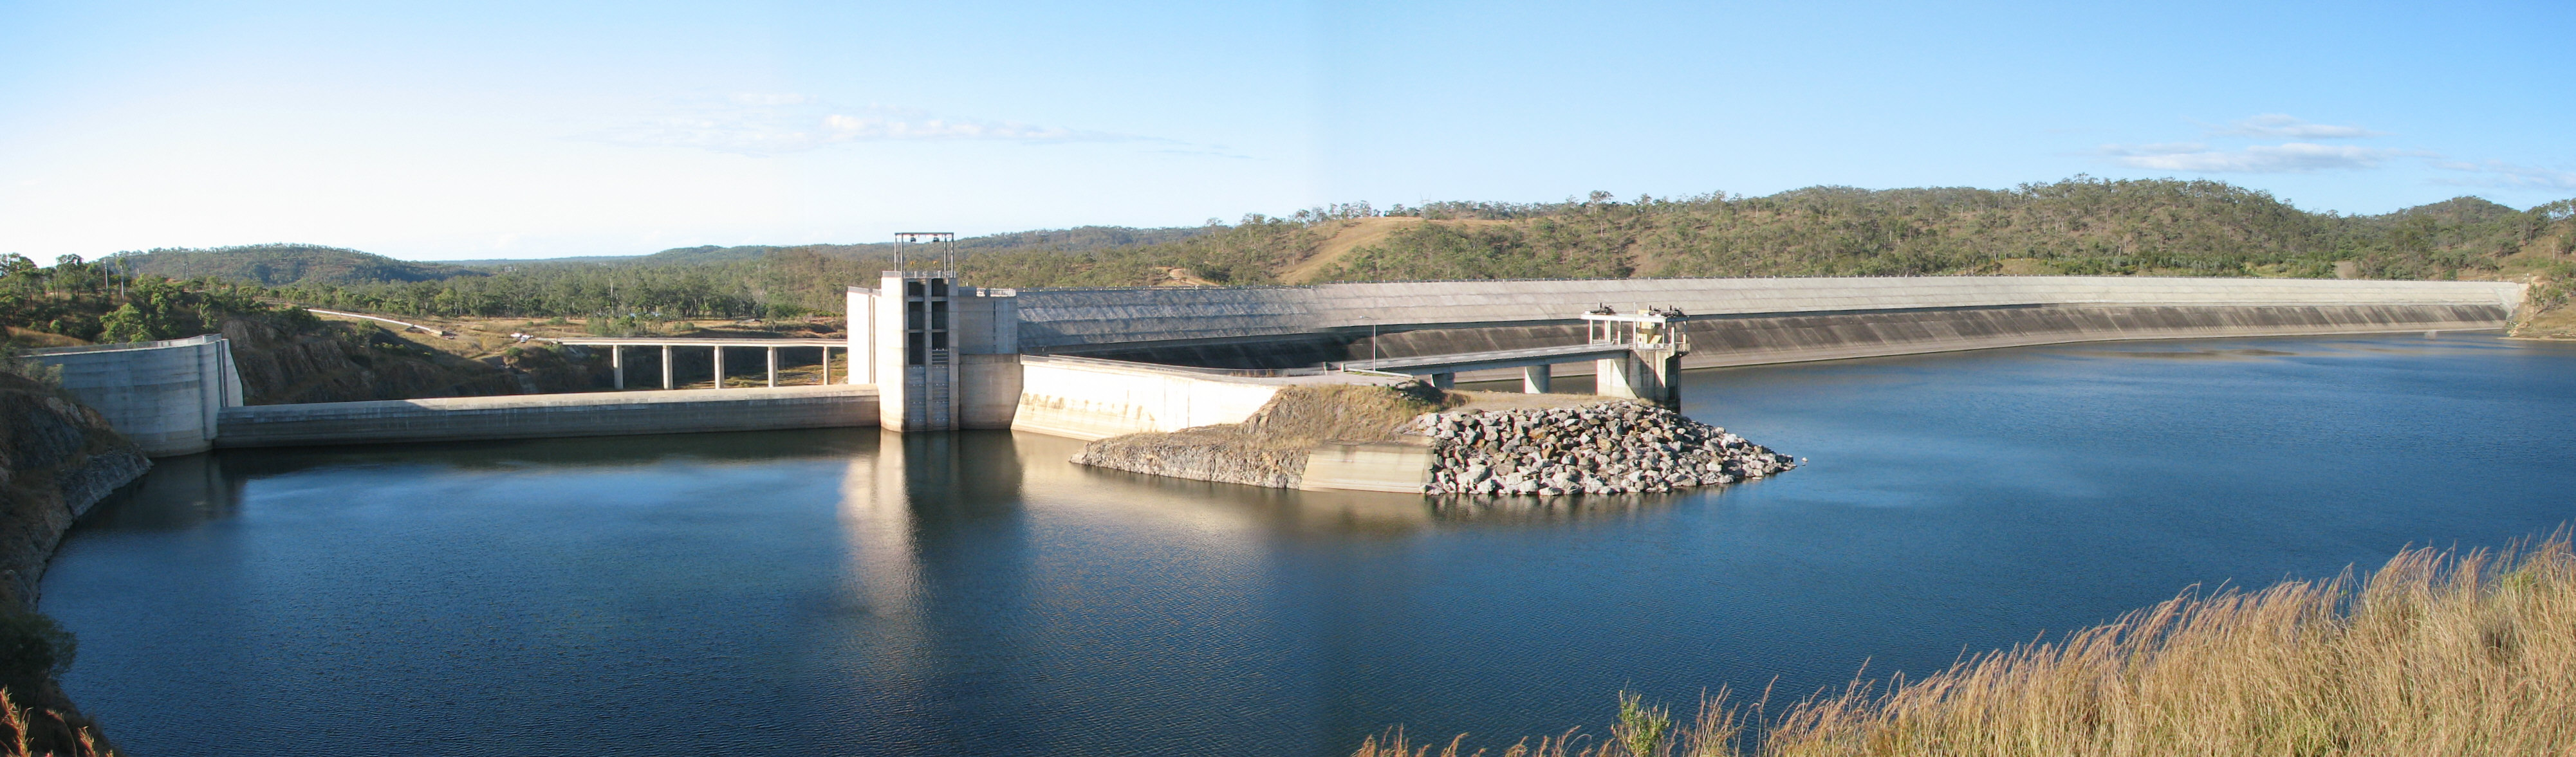 Awoonga Dam Spillway Upgrades